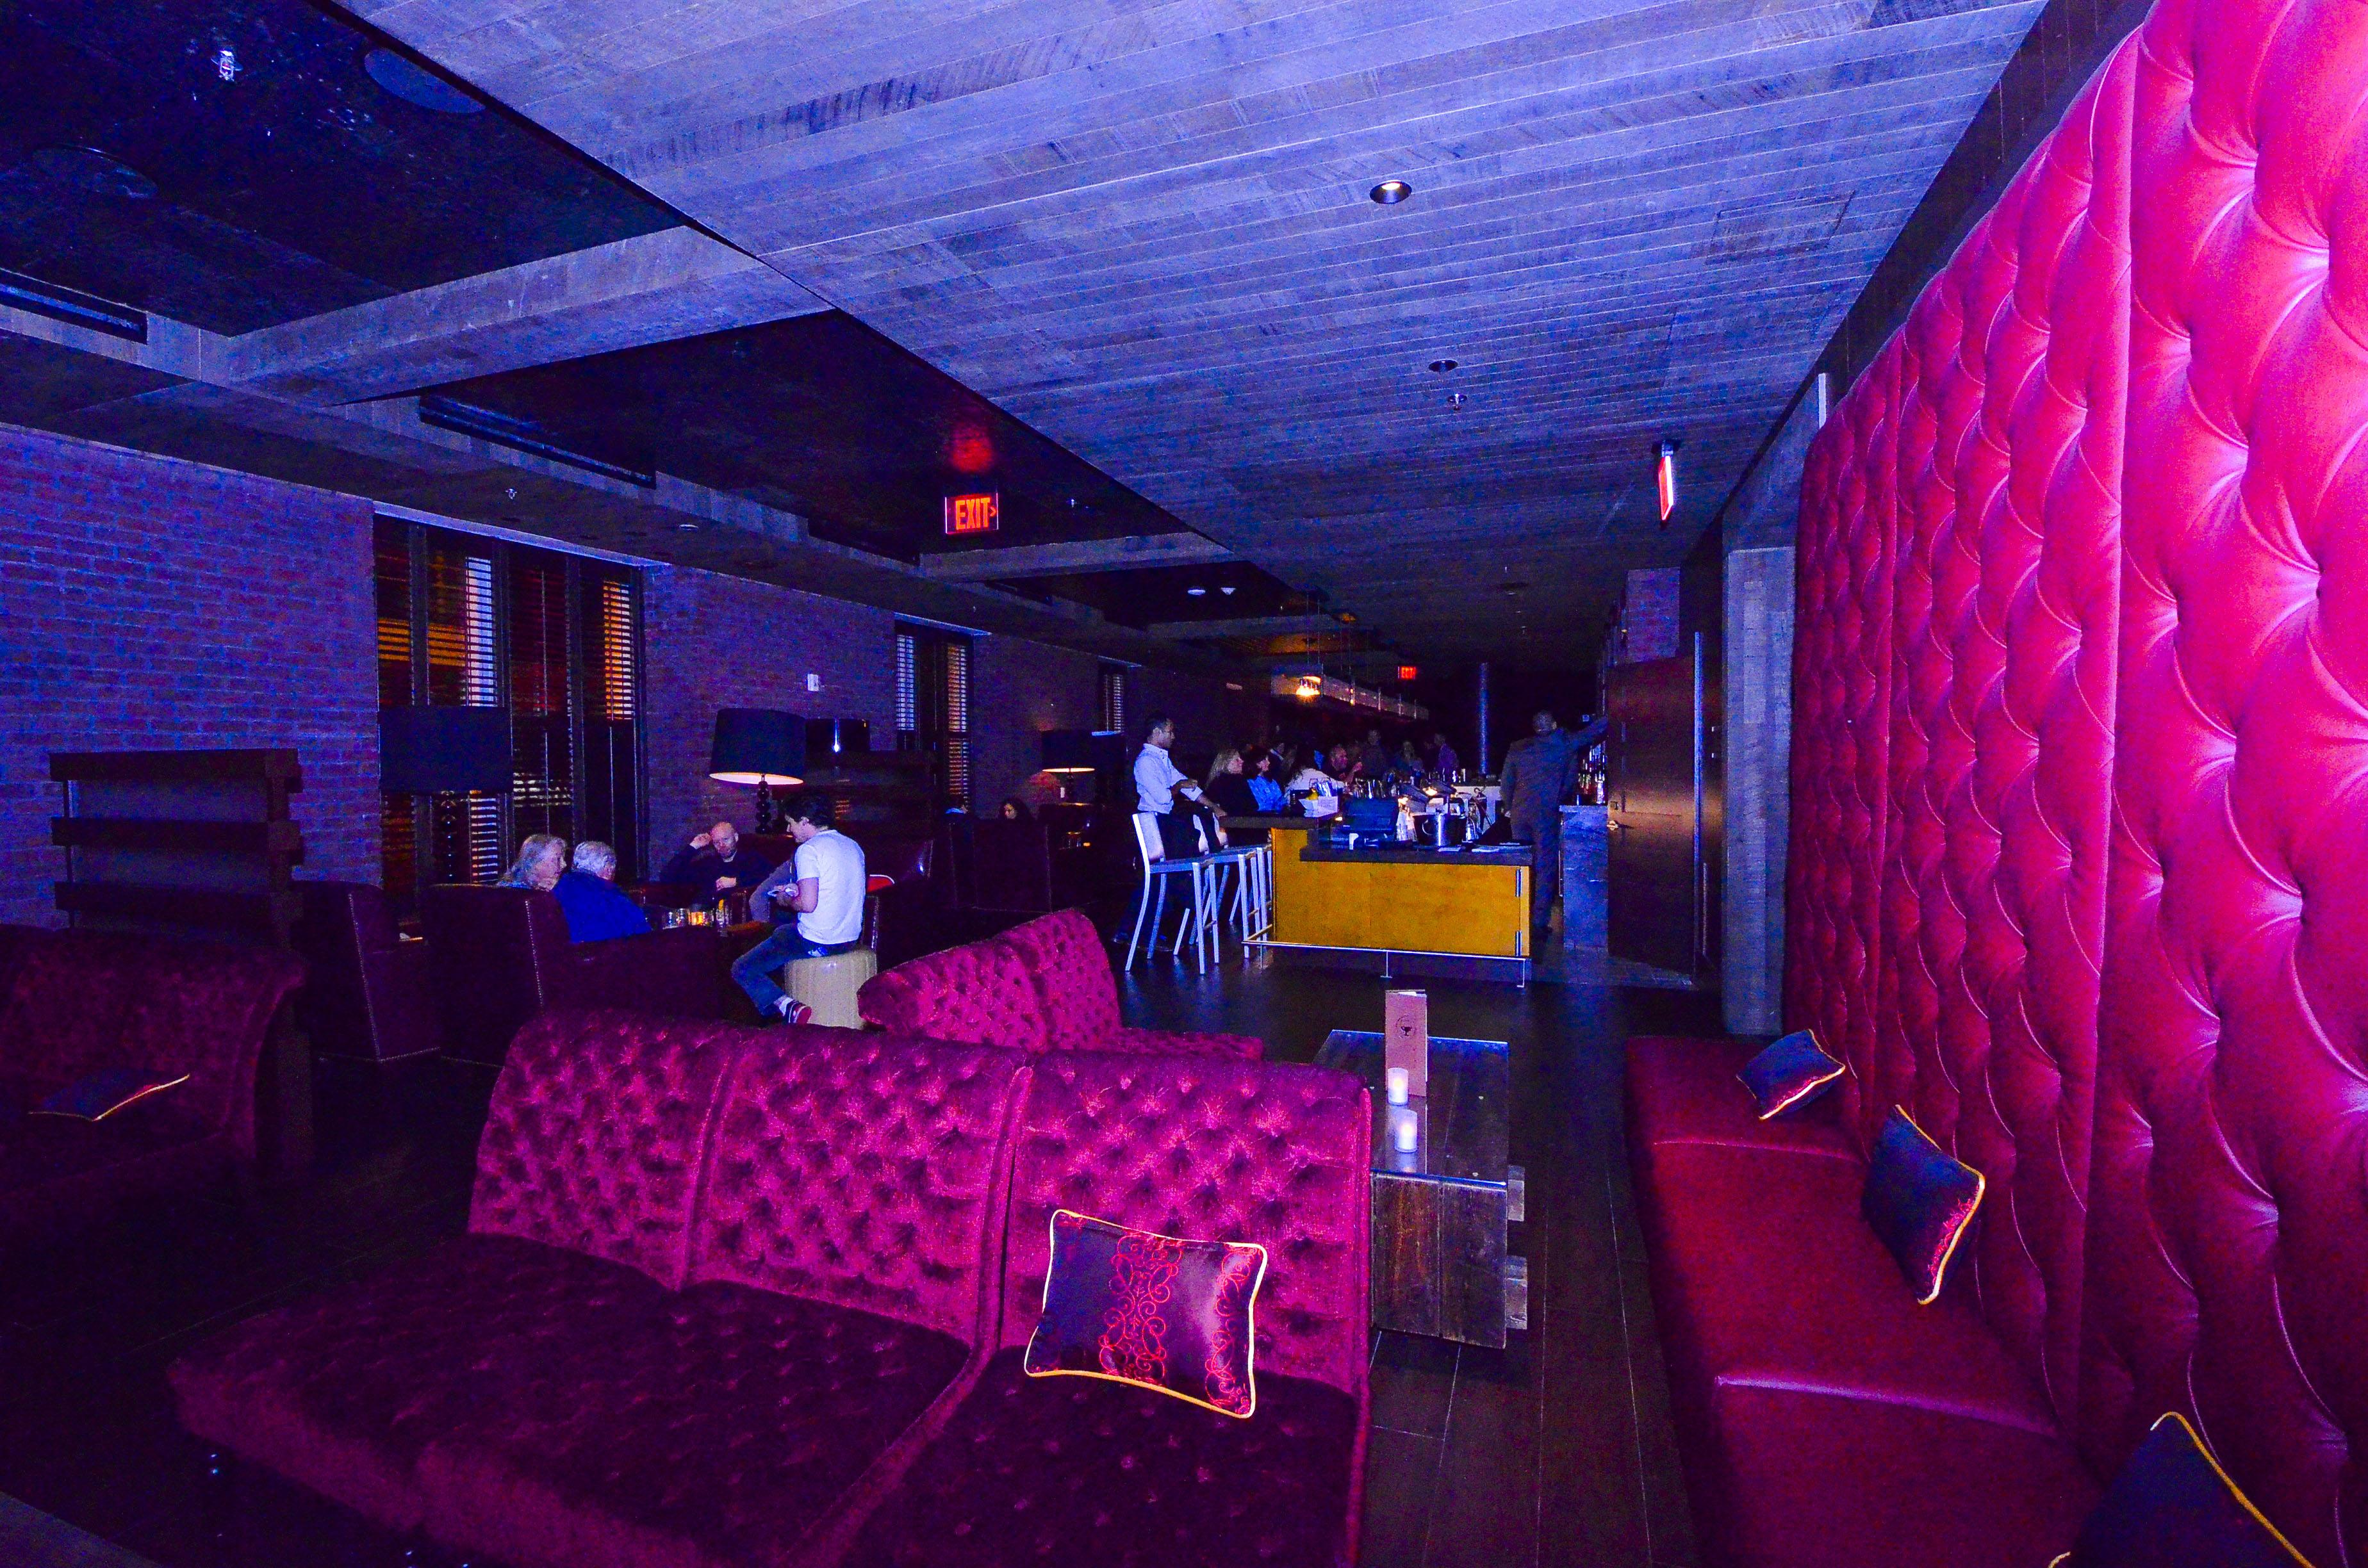 The Dignitary Bourbon Bar